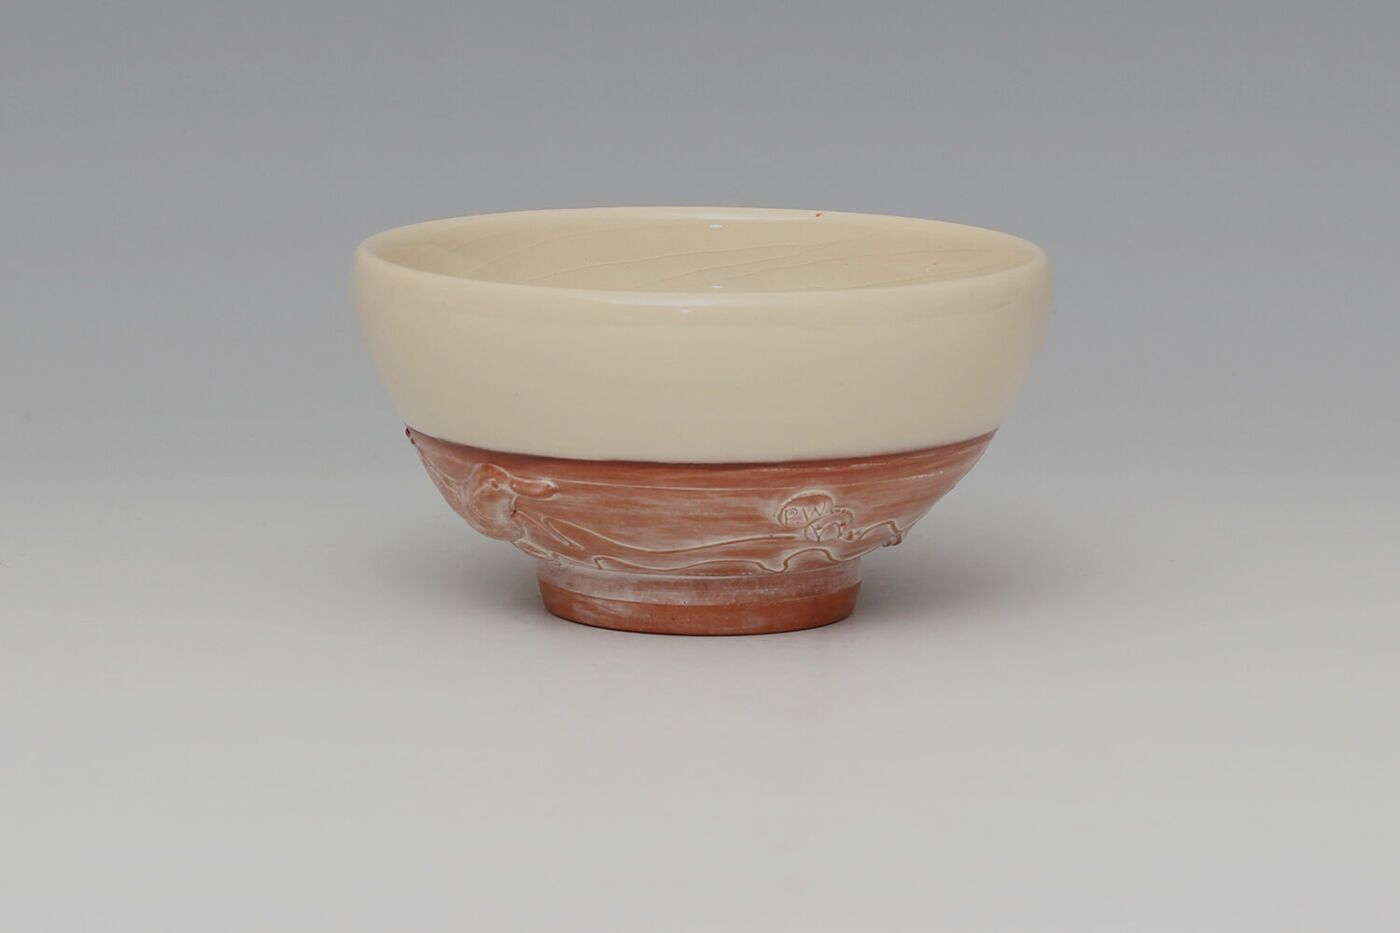 Philip Wood Small Ceramic Bowl 07